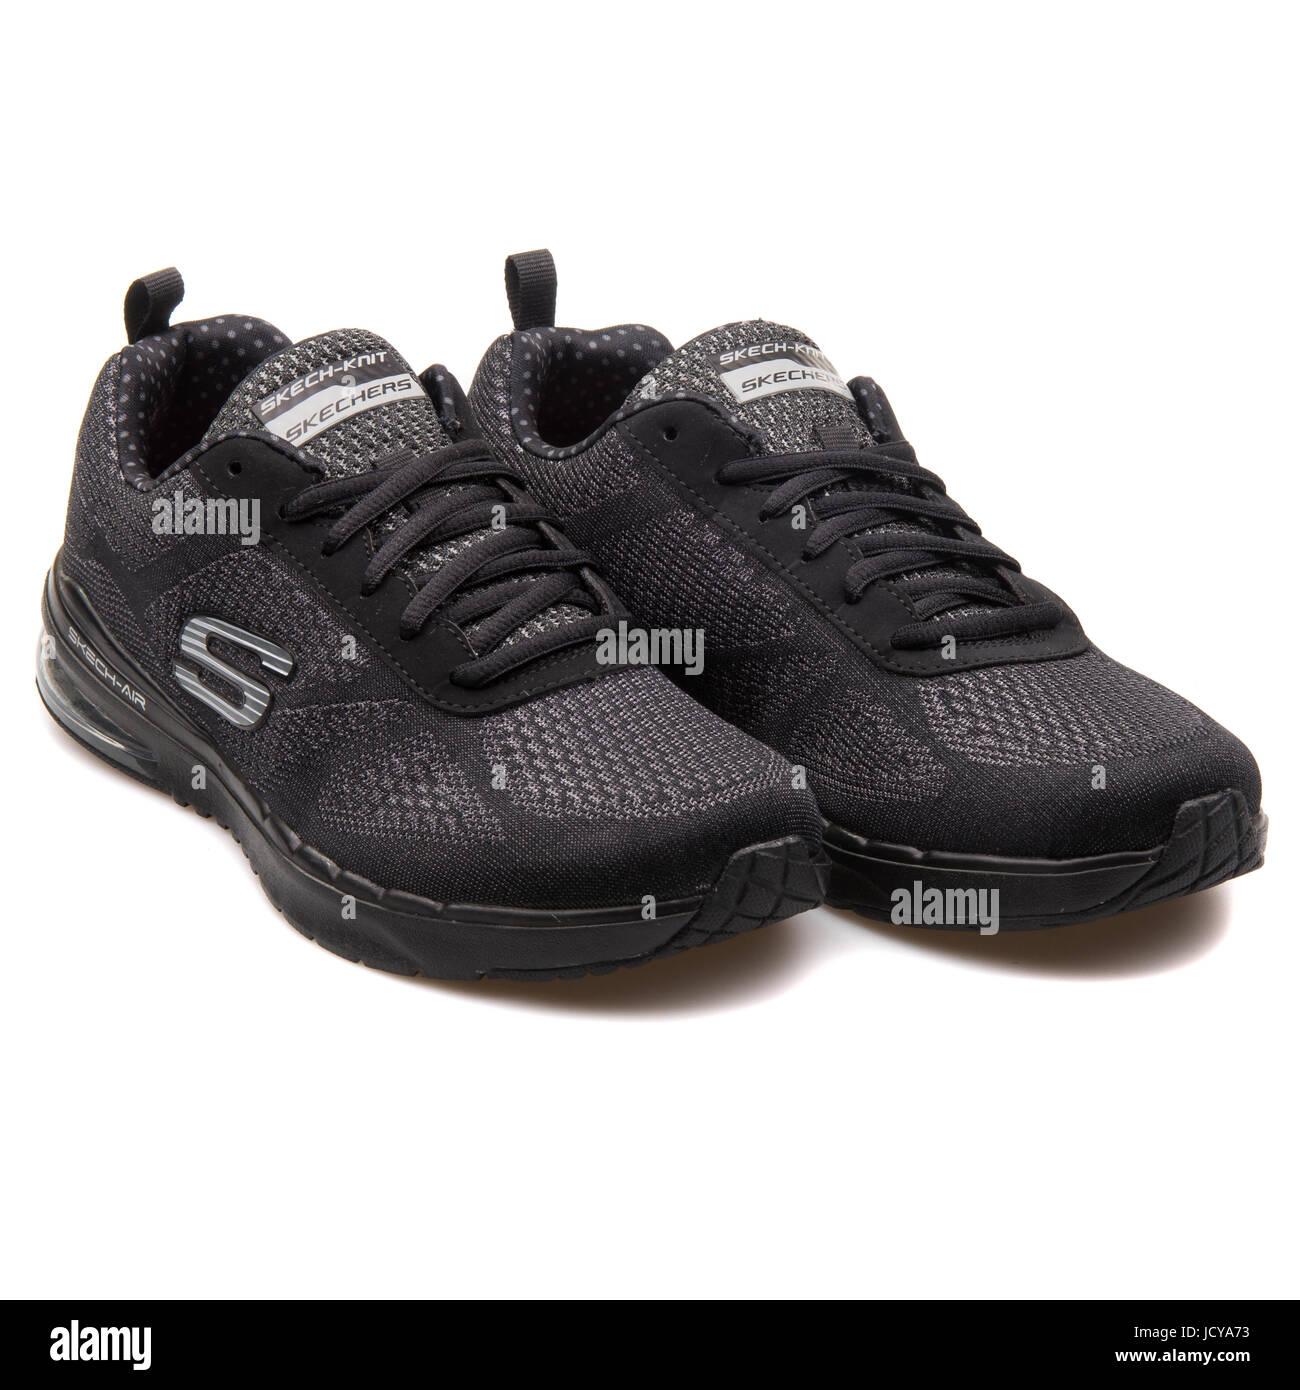 Skechers SkechAir Infinity 12111 Sport Shoes Color Black  Women